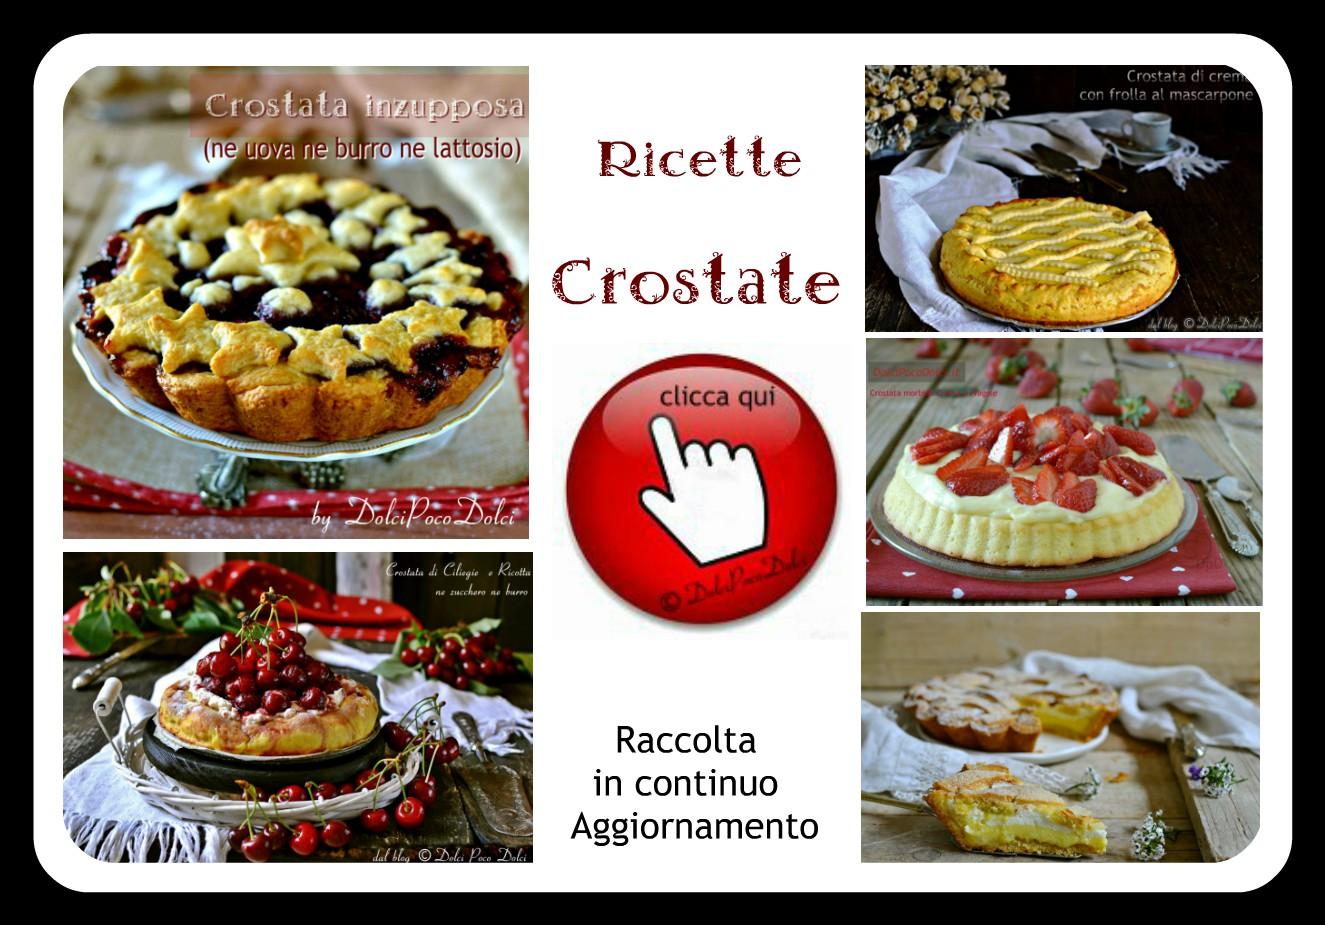 Ricette Crostate